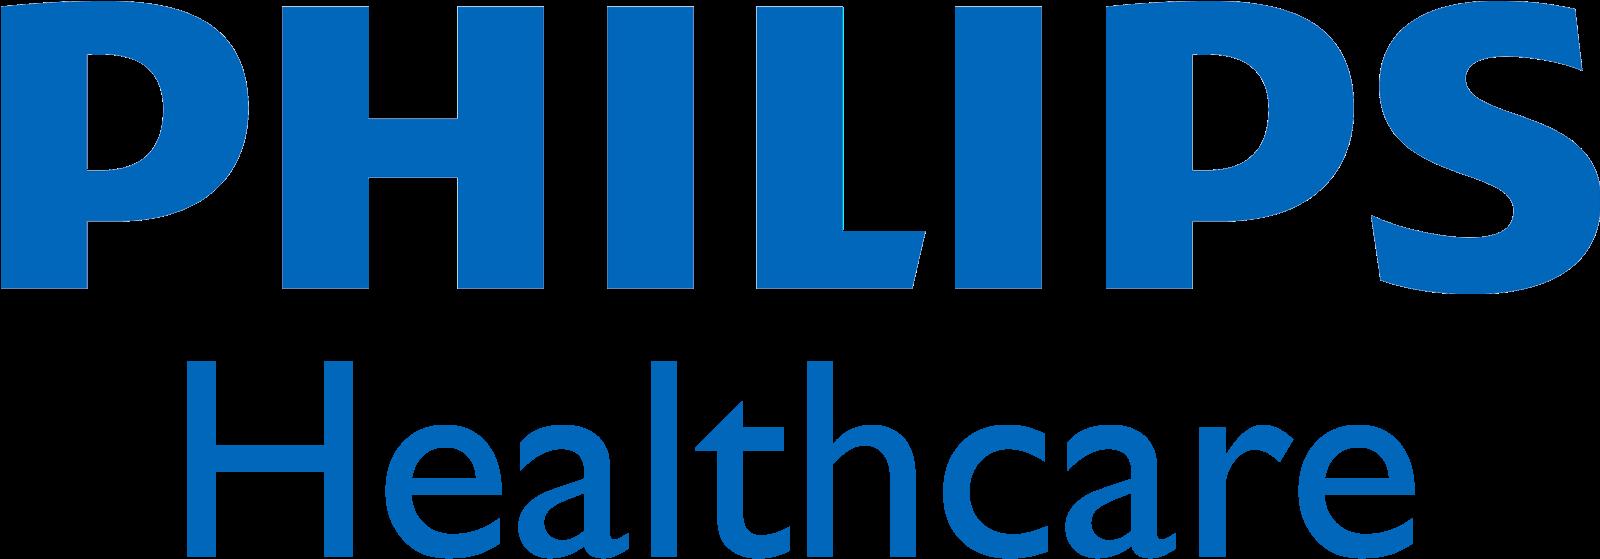 210-2103341_senior-legal-director-regulatory-global-healthcare-philips-healthcare.png